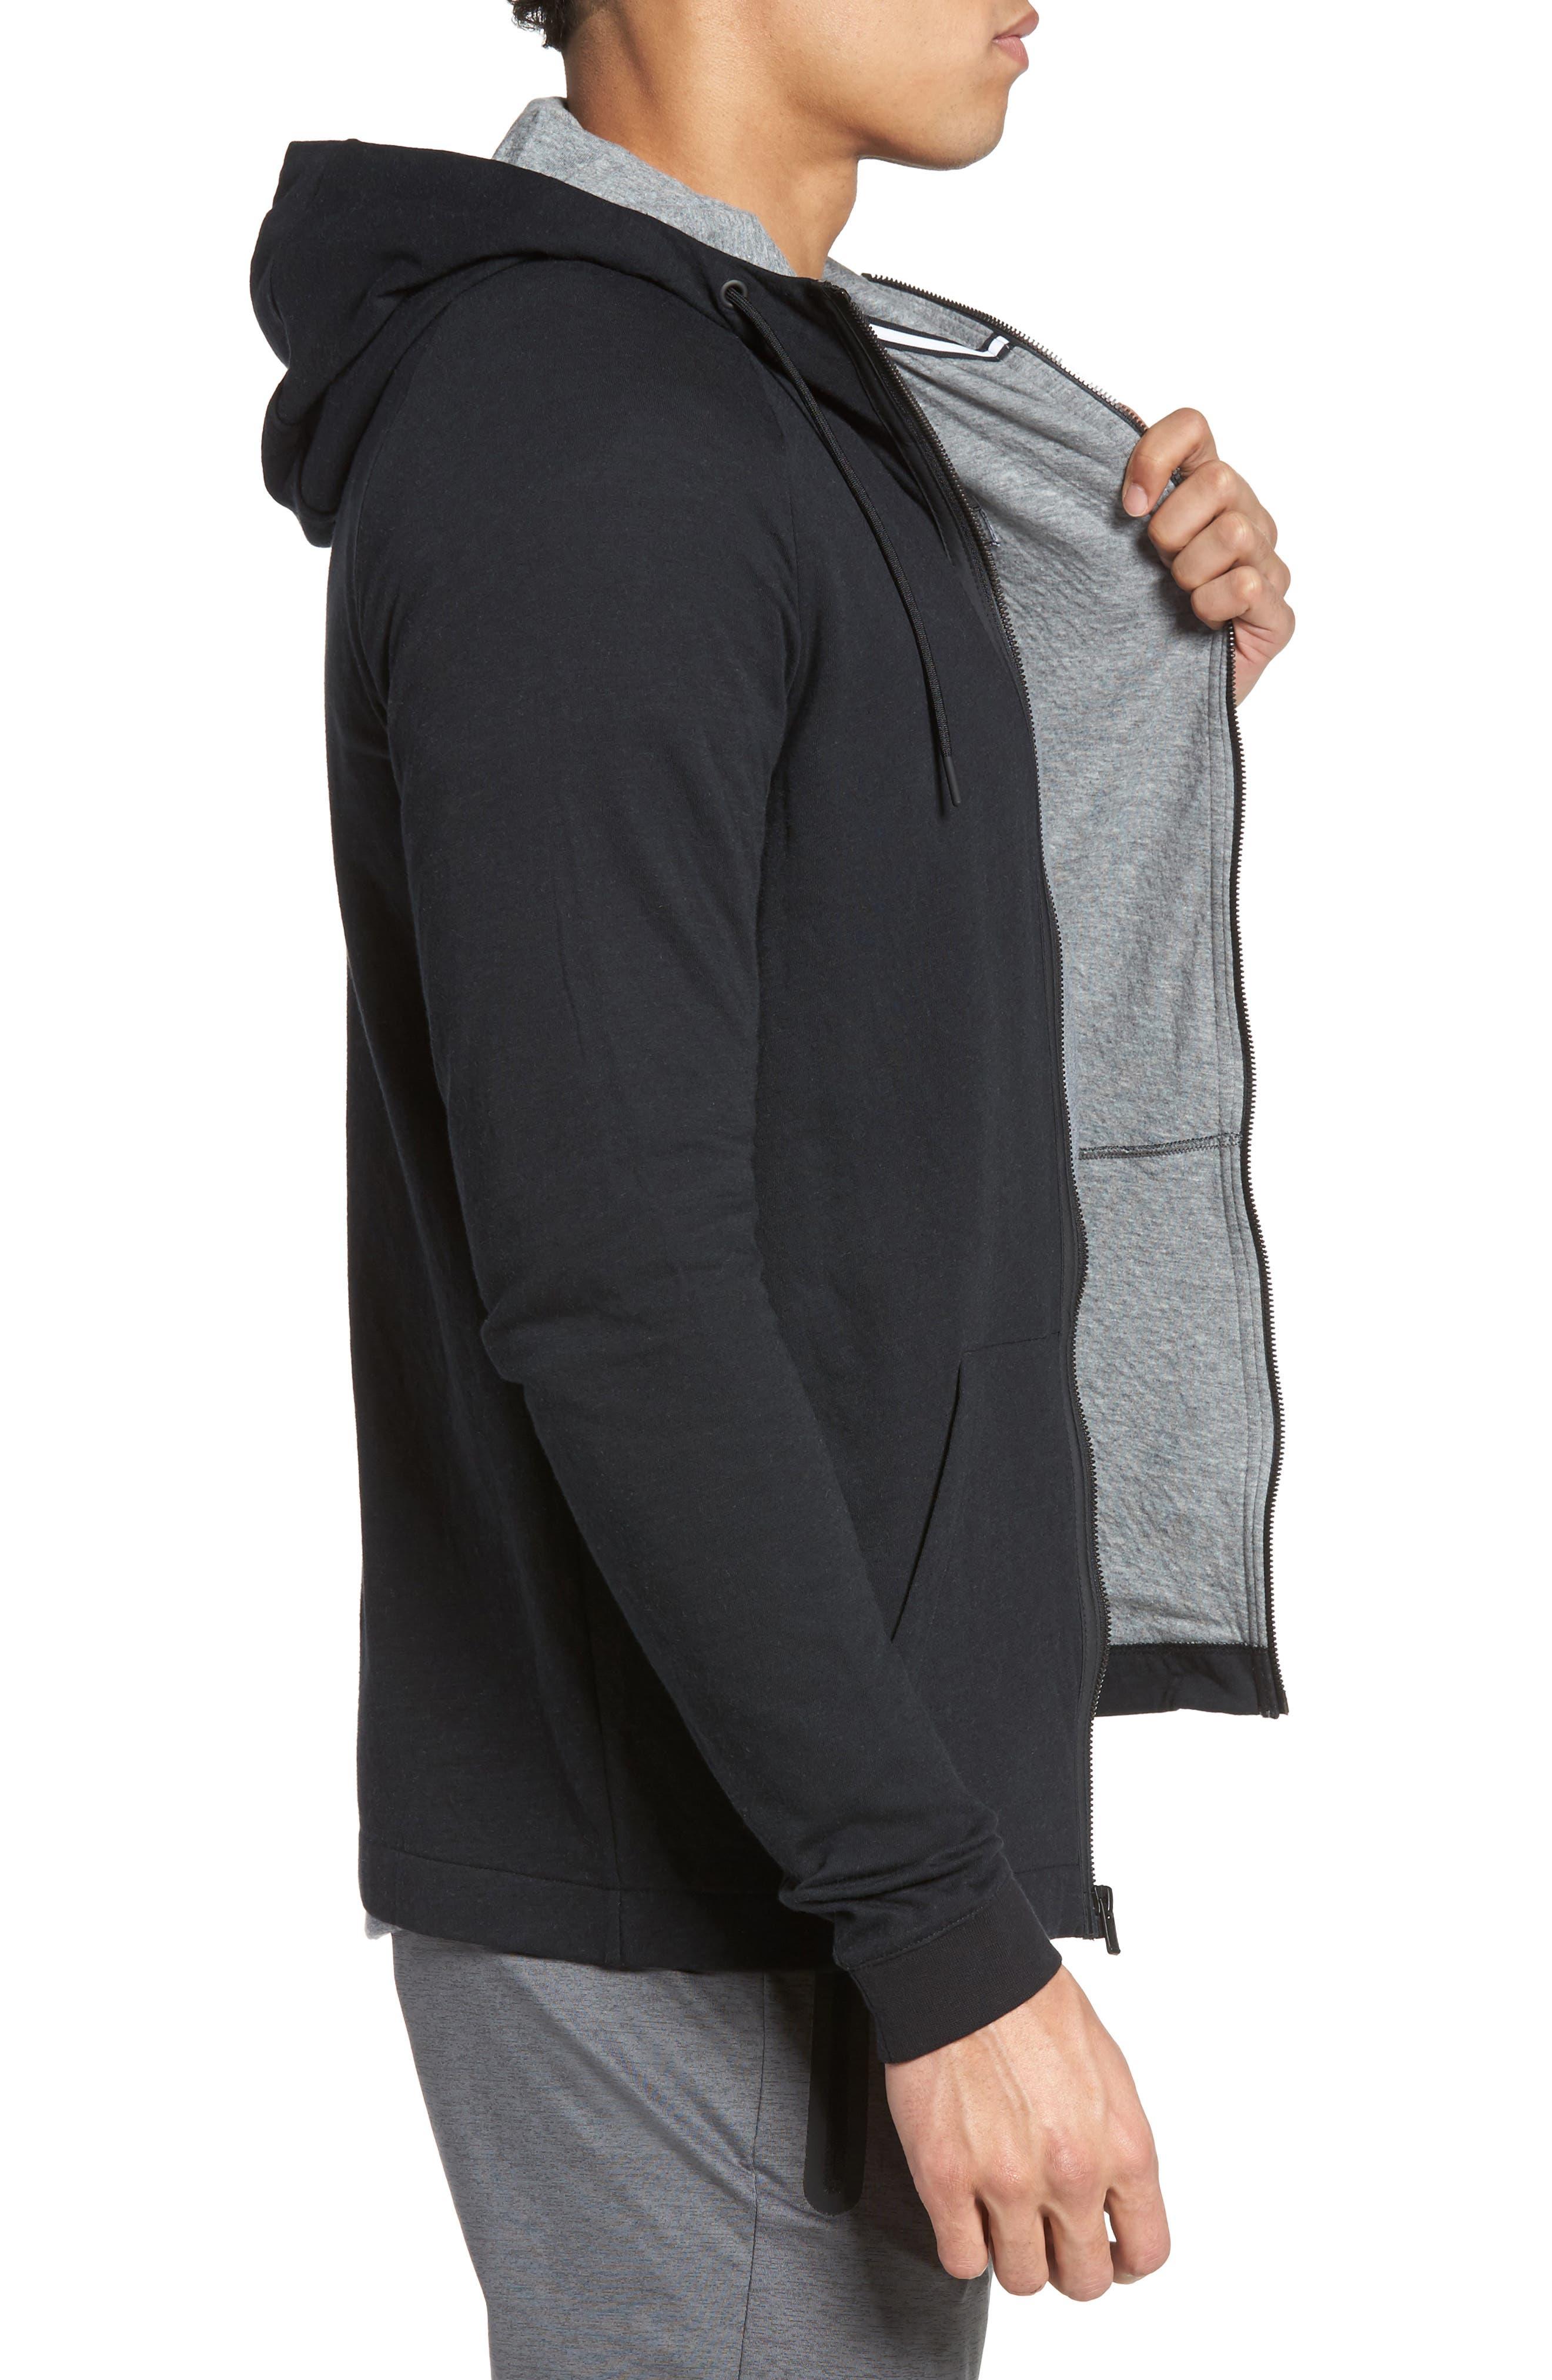 NIKE, Tech Regular Fit Fleece Hoodie, Alternate thumbnail 4, color, BLACK/ CARBON HEATHER